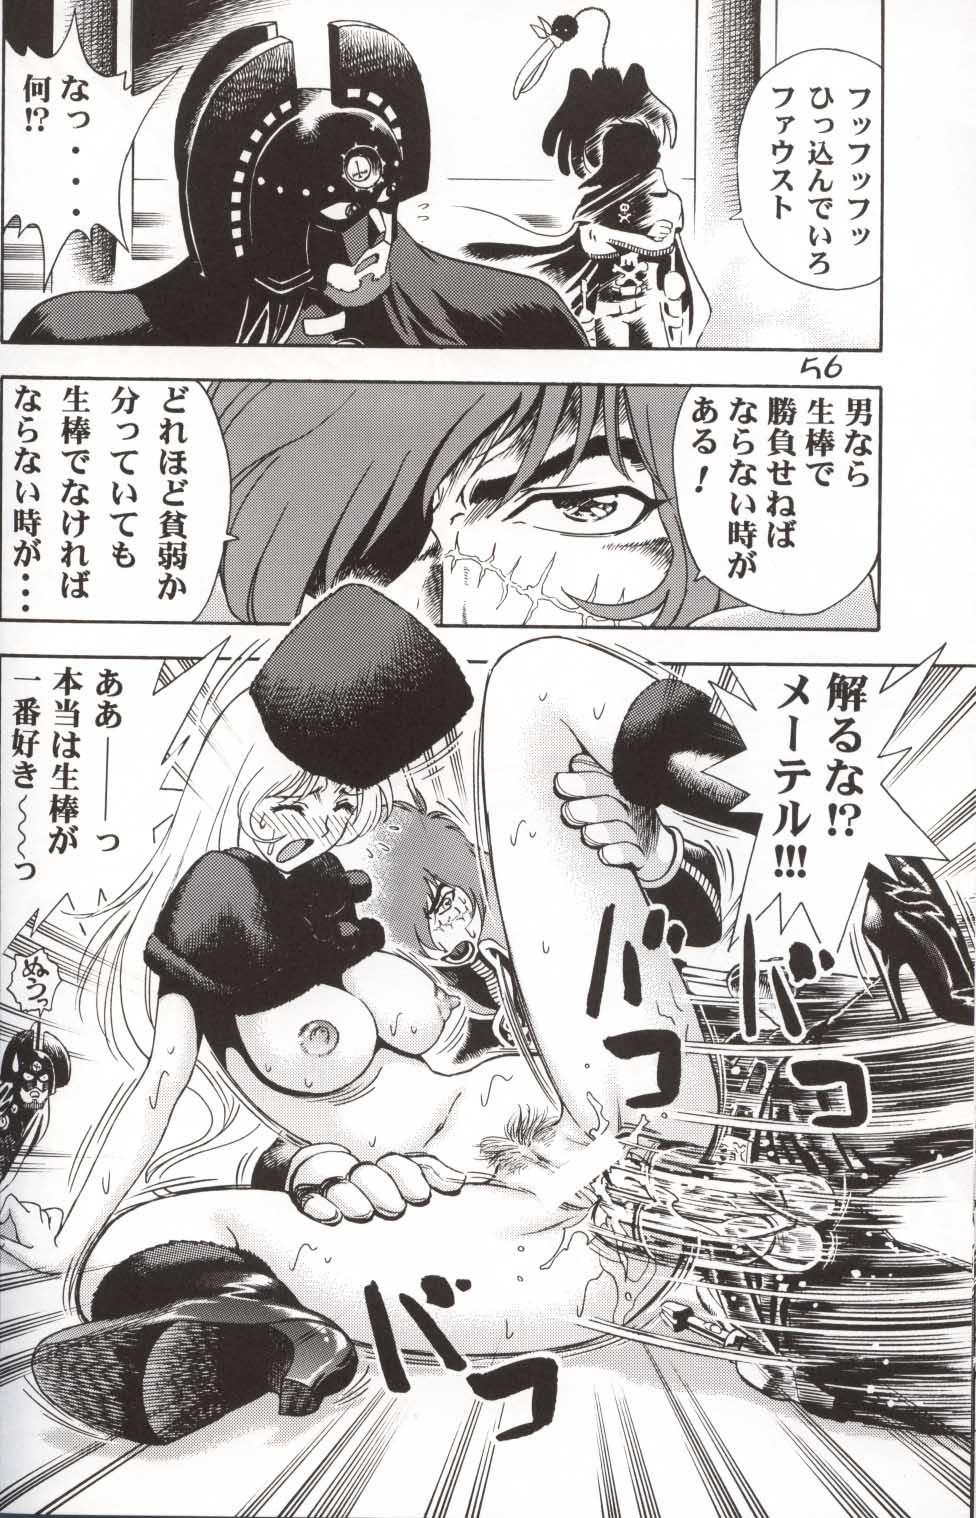 GIRL POWER Vol.10 53